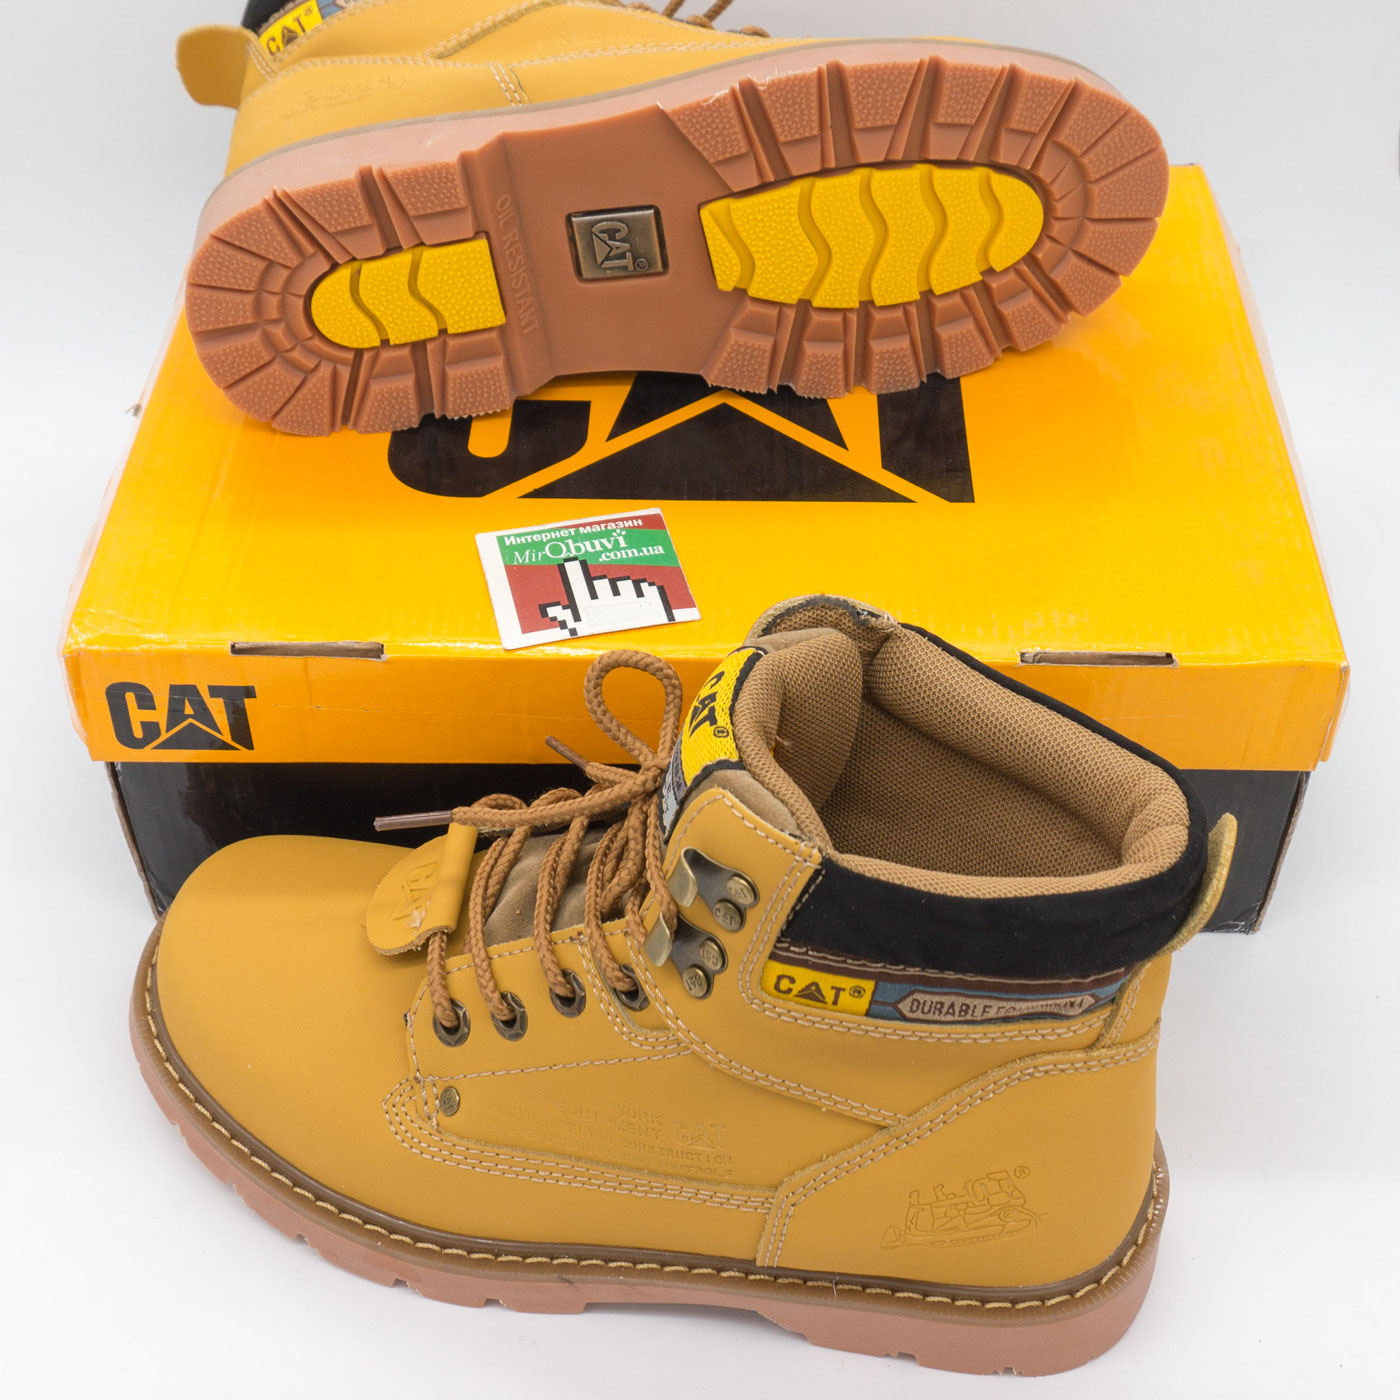 фото bottom Желтые женские ботинки CAT (катерпиллер)  bottom